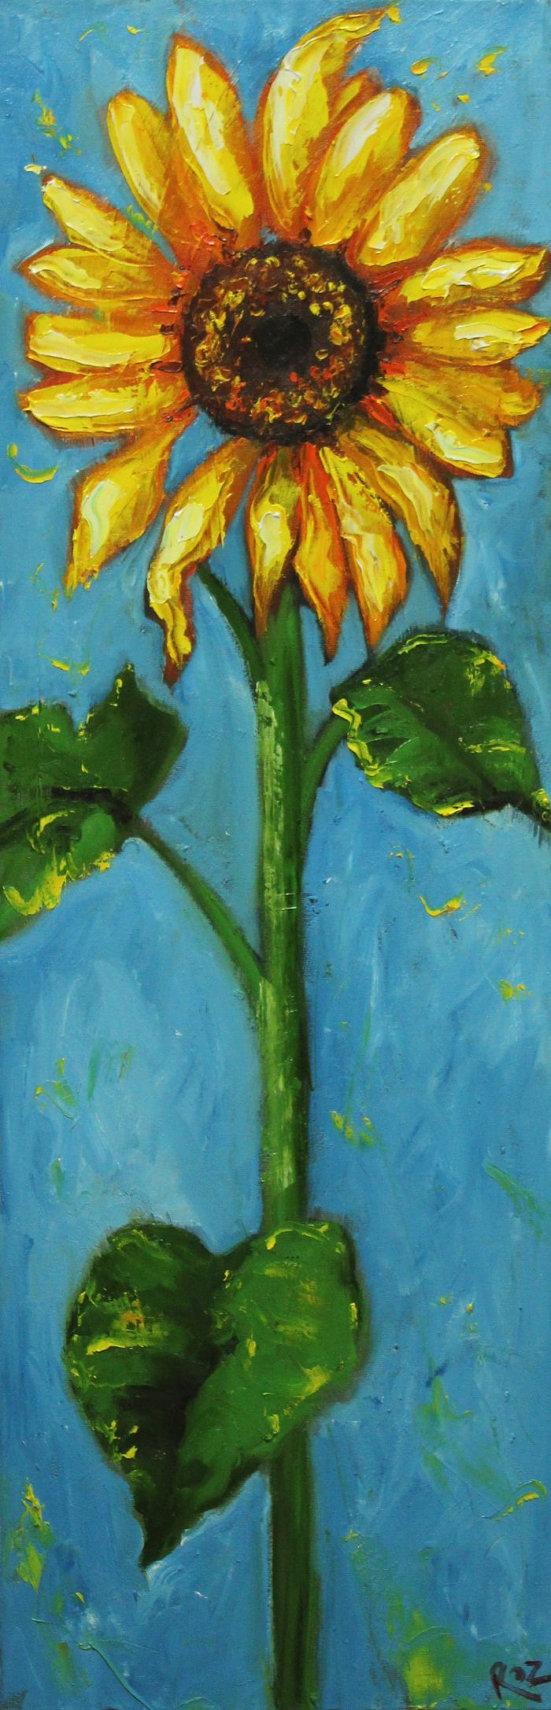 20 Vertical Paintings Ideas Painting Art Art Inspiration